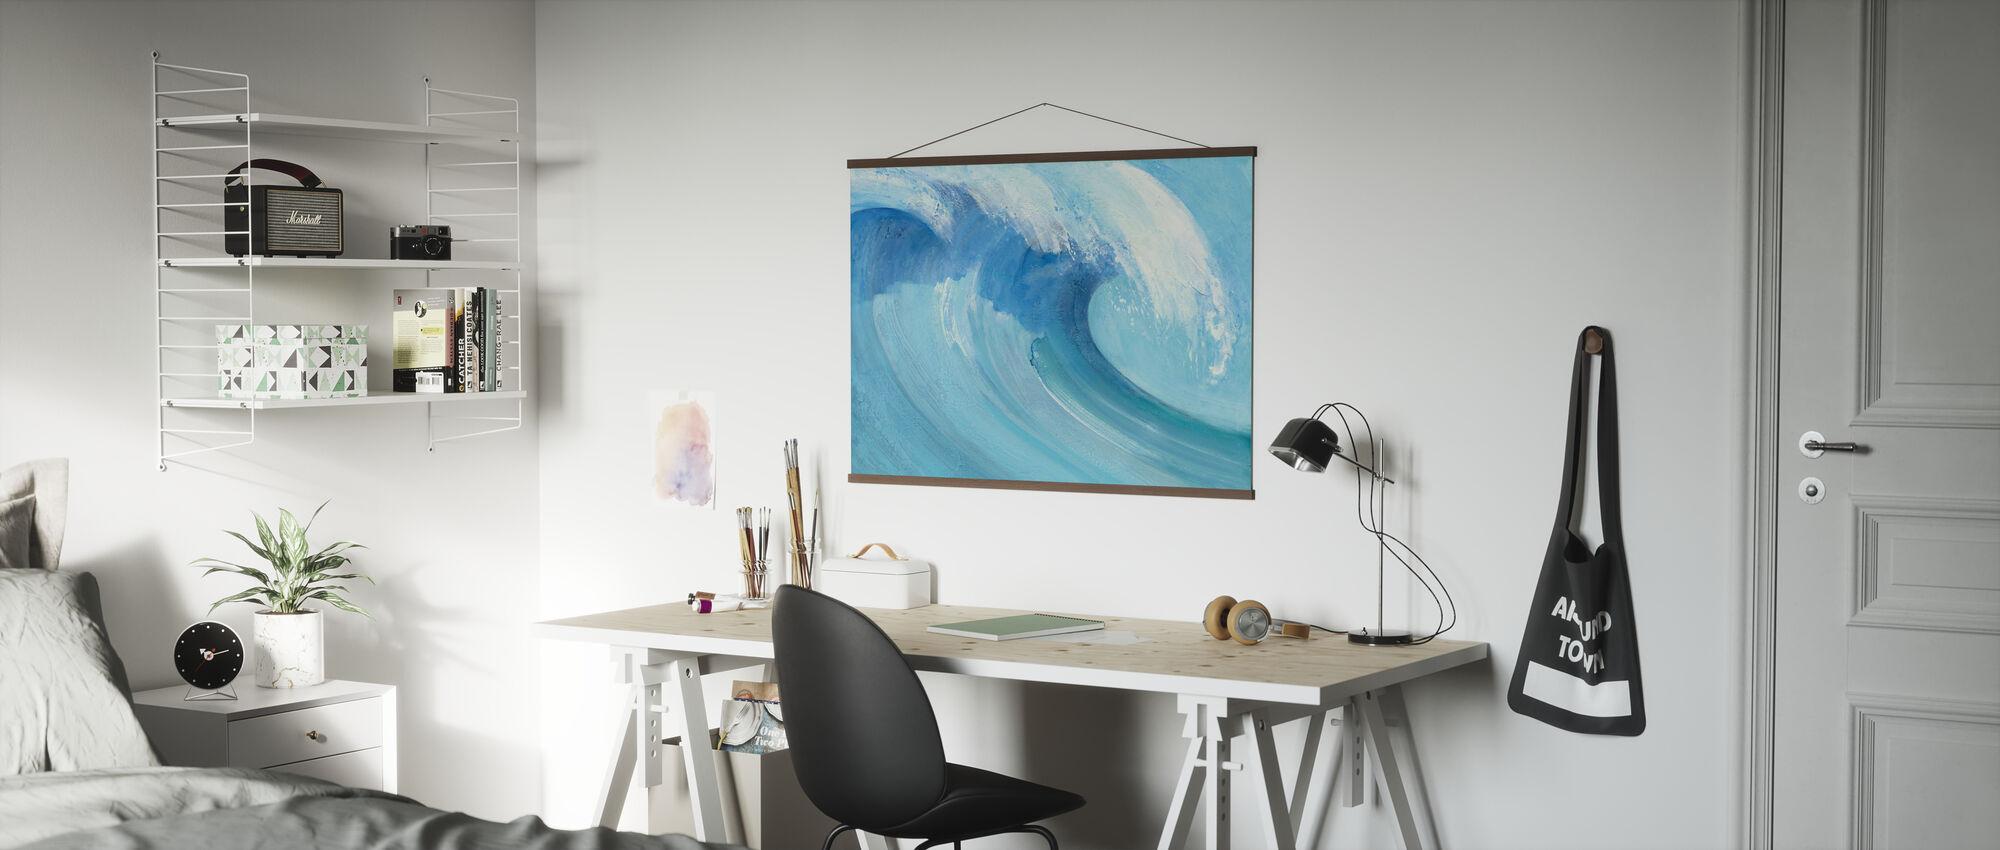 Fang en bølge - Plakat - Kontor